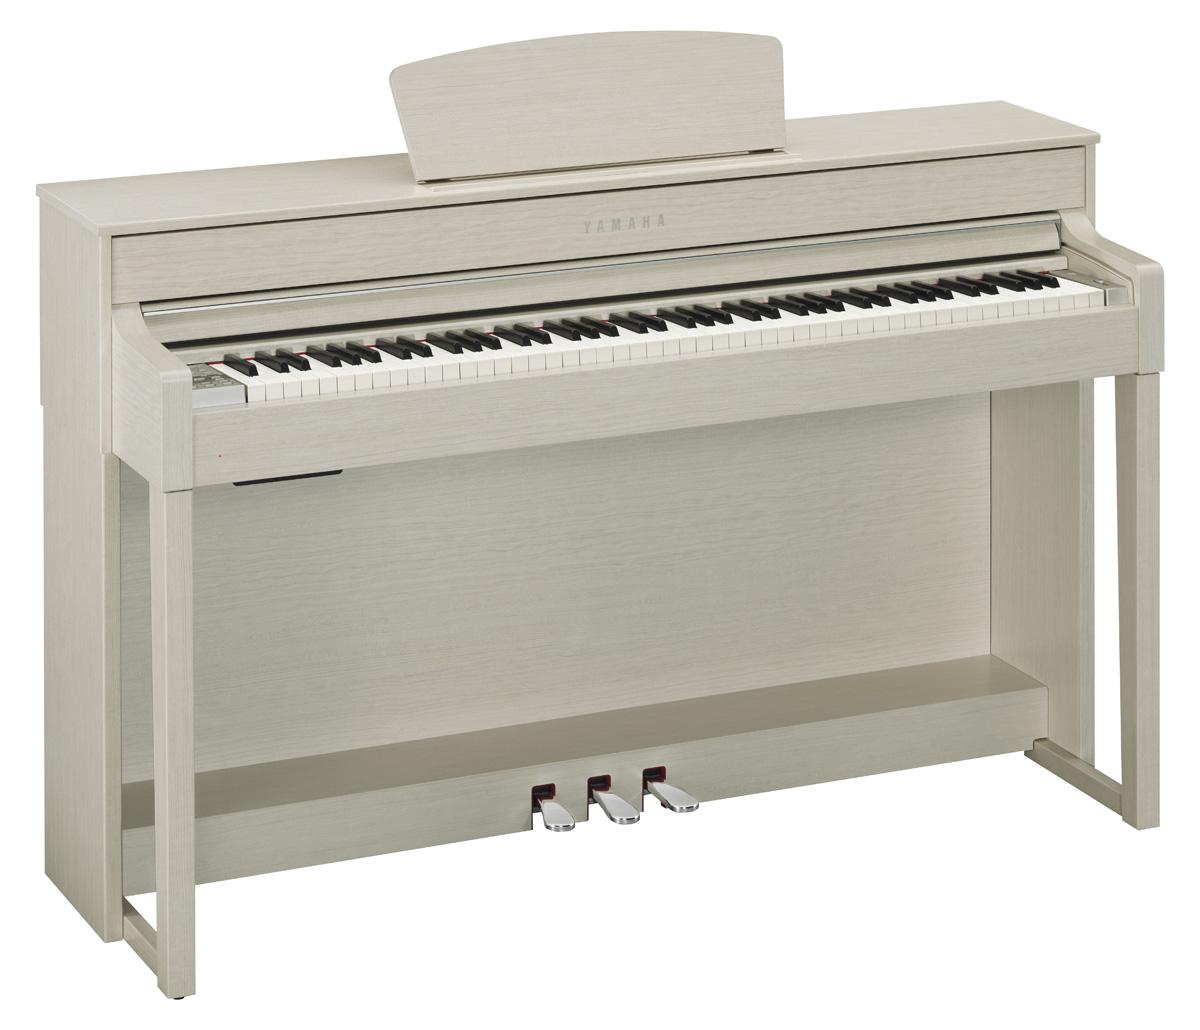 yamaha clp 535 clavinova digital piano in white ash finish. Black Bedroom Furniture Sets. Home Design Ideas